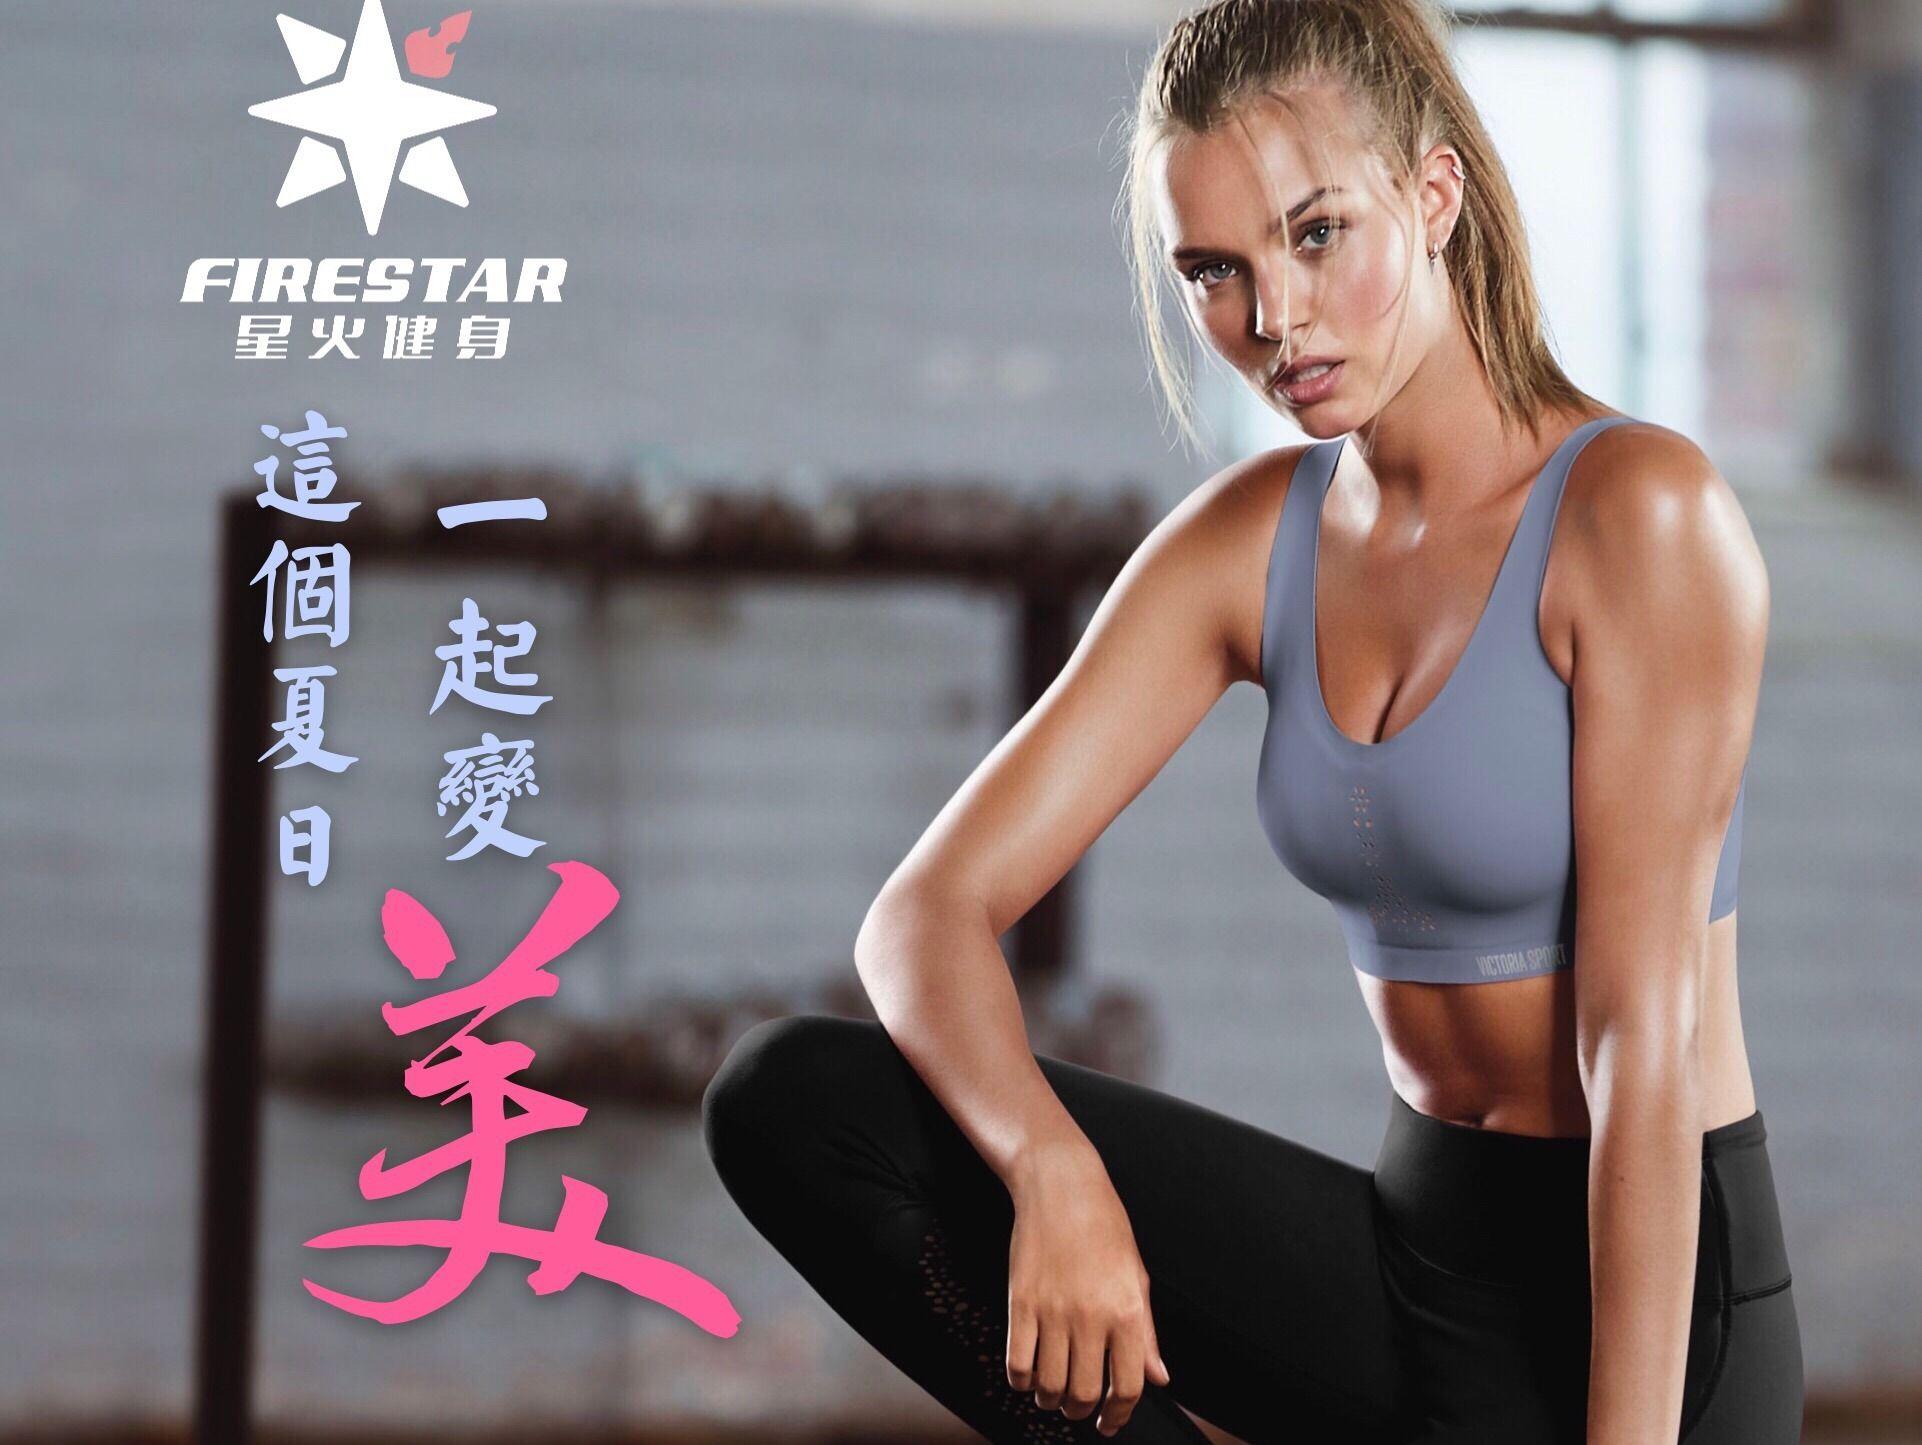 FireStar 星火健身私教工作室